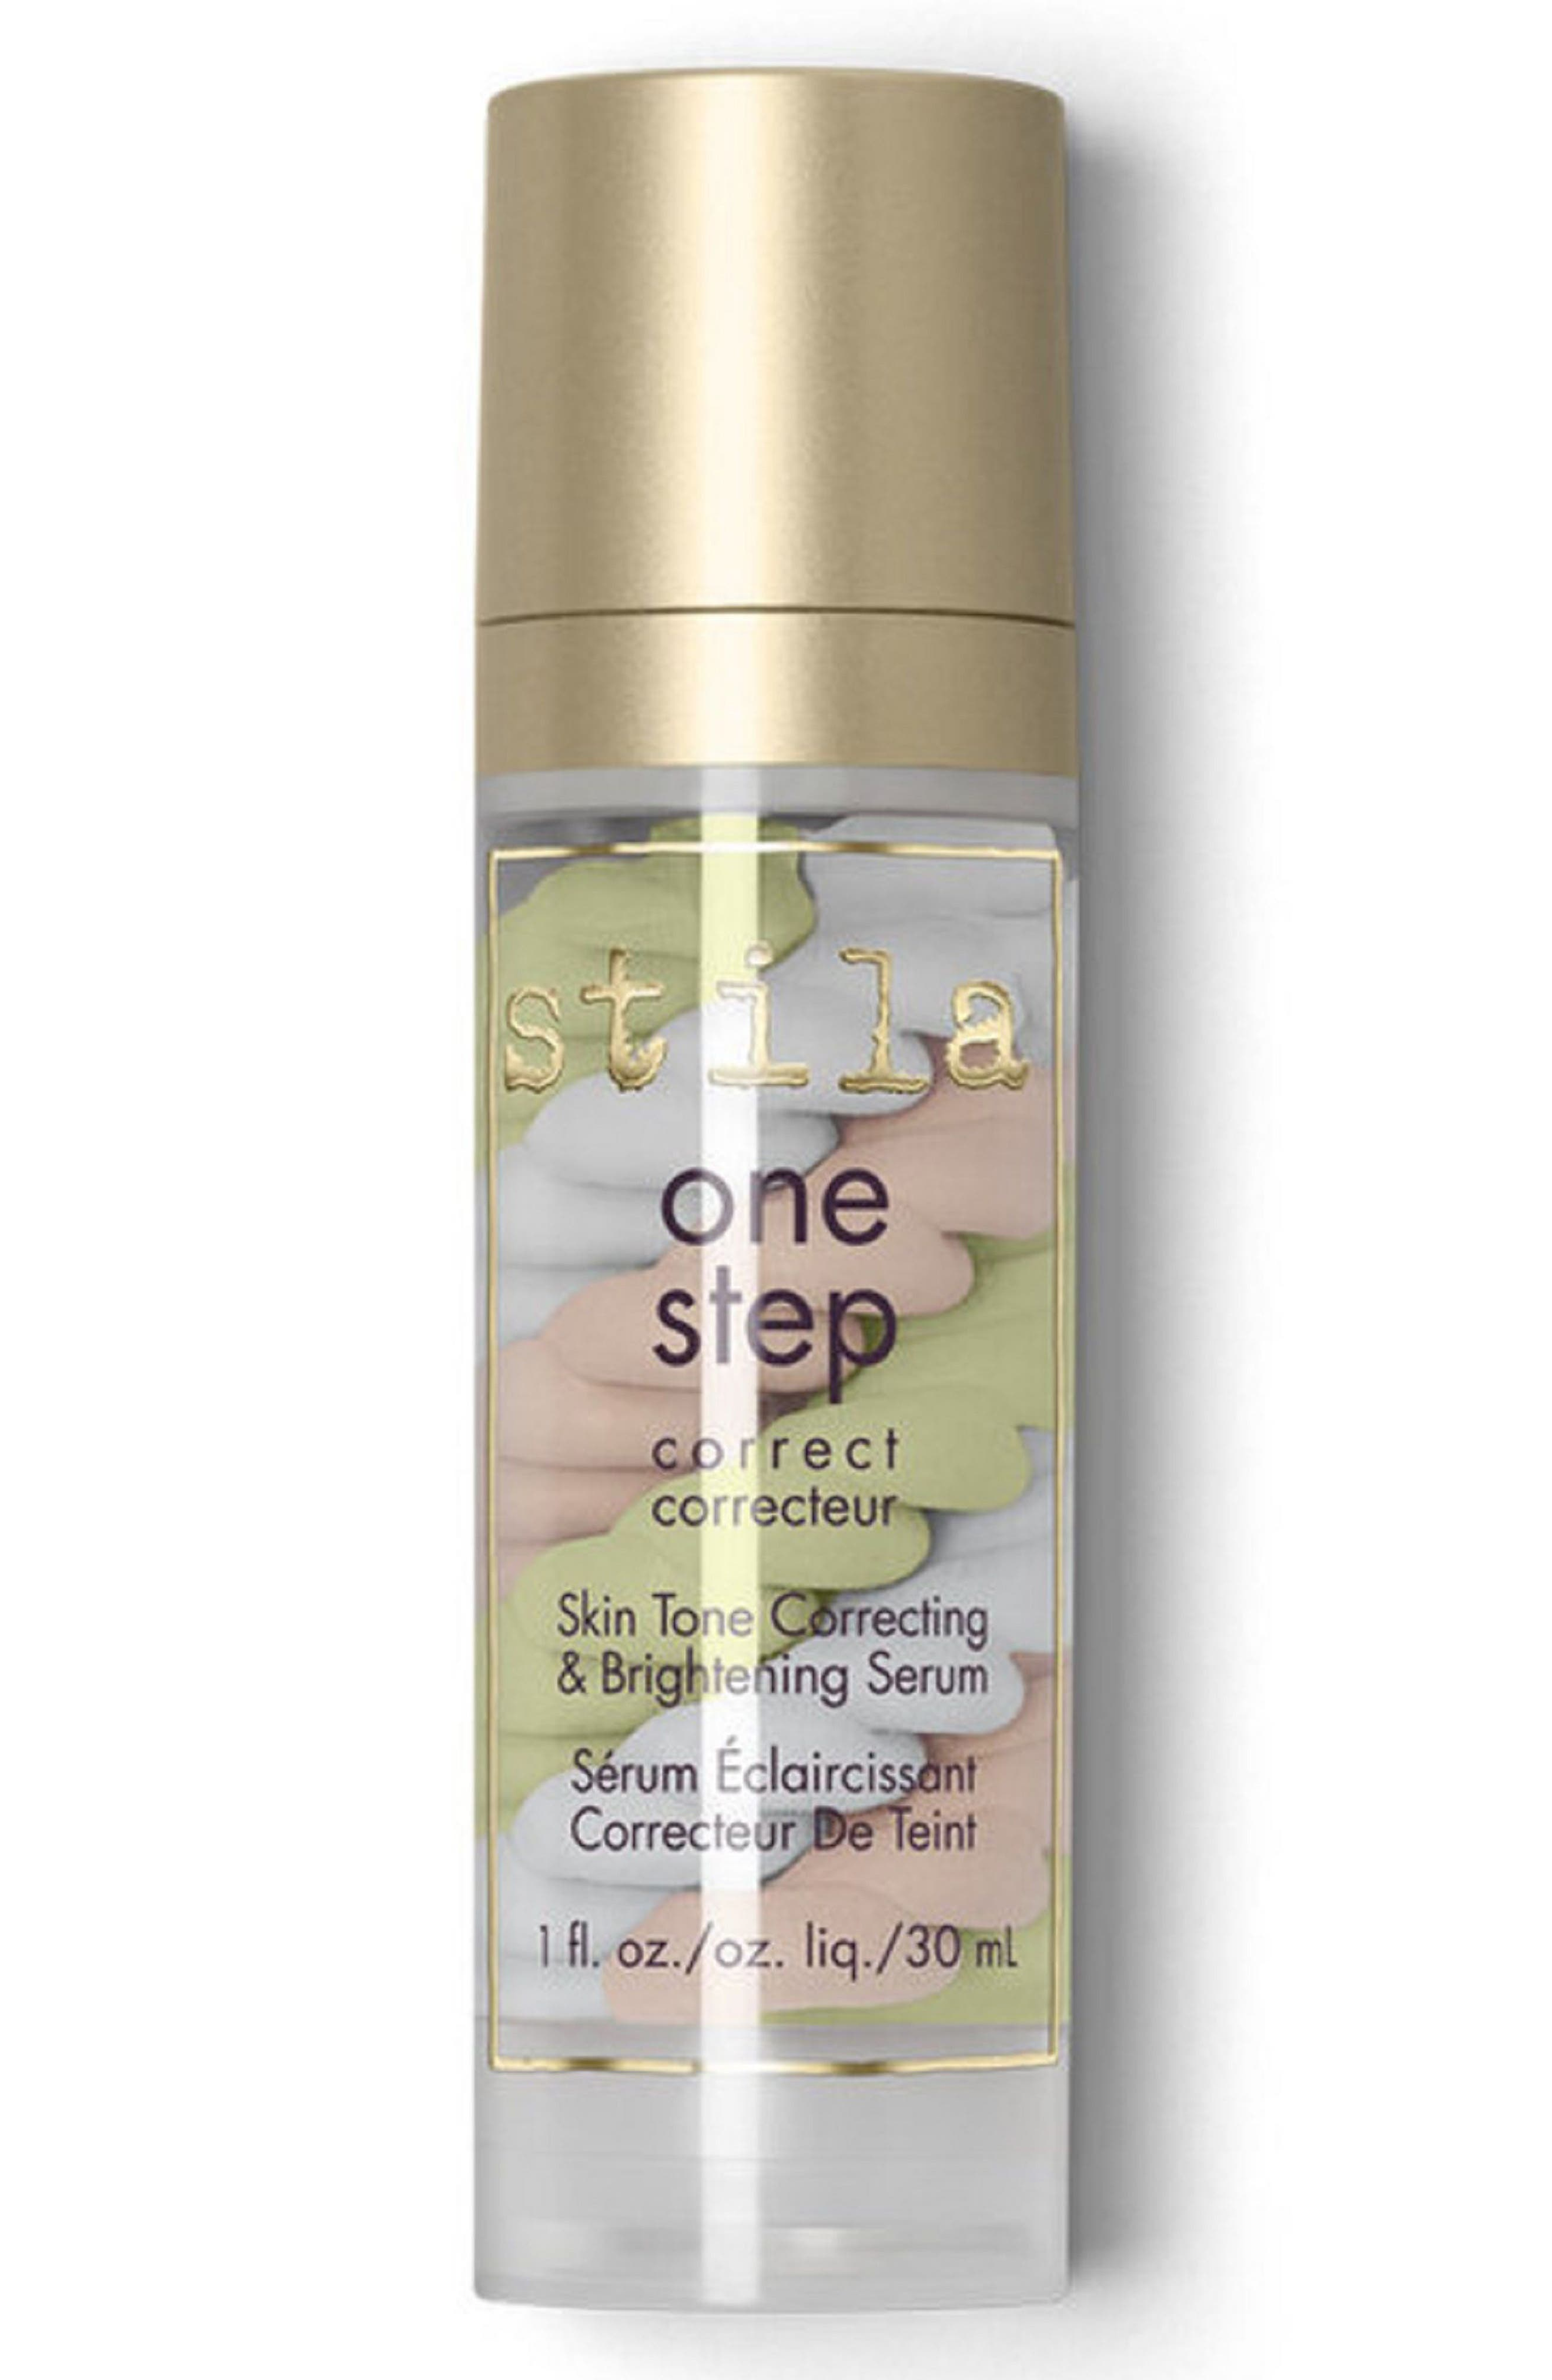 STILA One Step Correct Skin Tone Correcting Brightening Serum, Main, color, NO COLOR